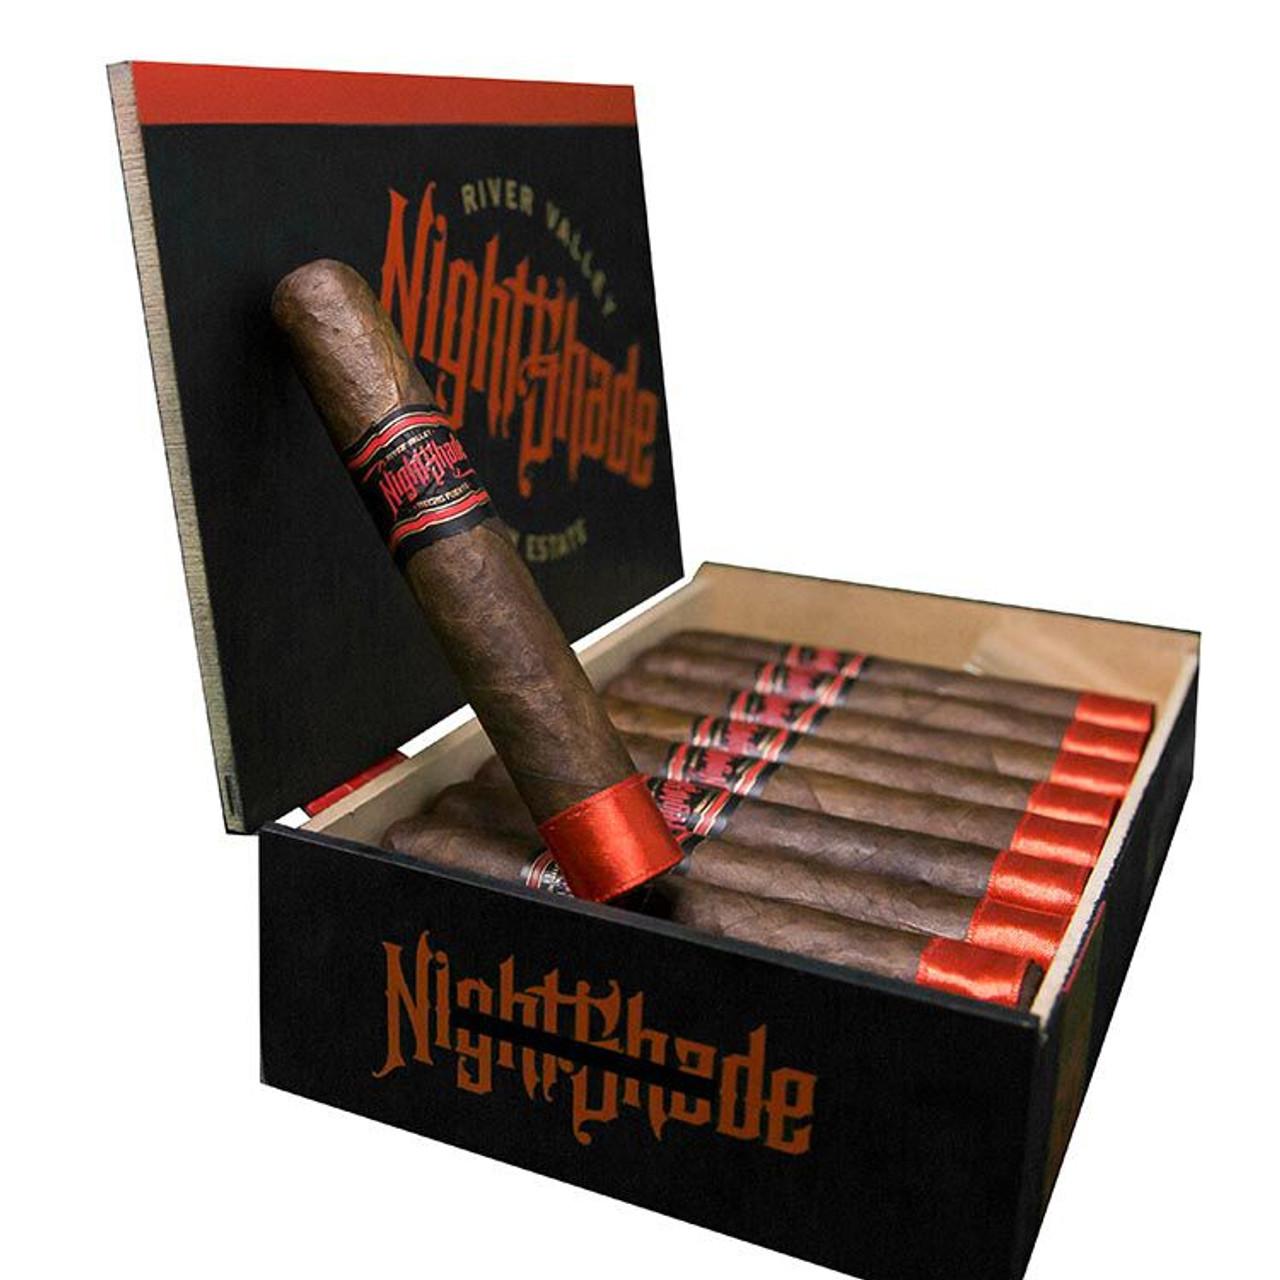 NightShade by Drew Estate Toro Cigars - 6.5 x 54 (Box of 20)